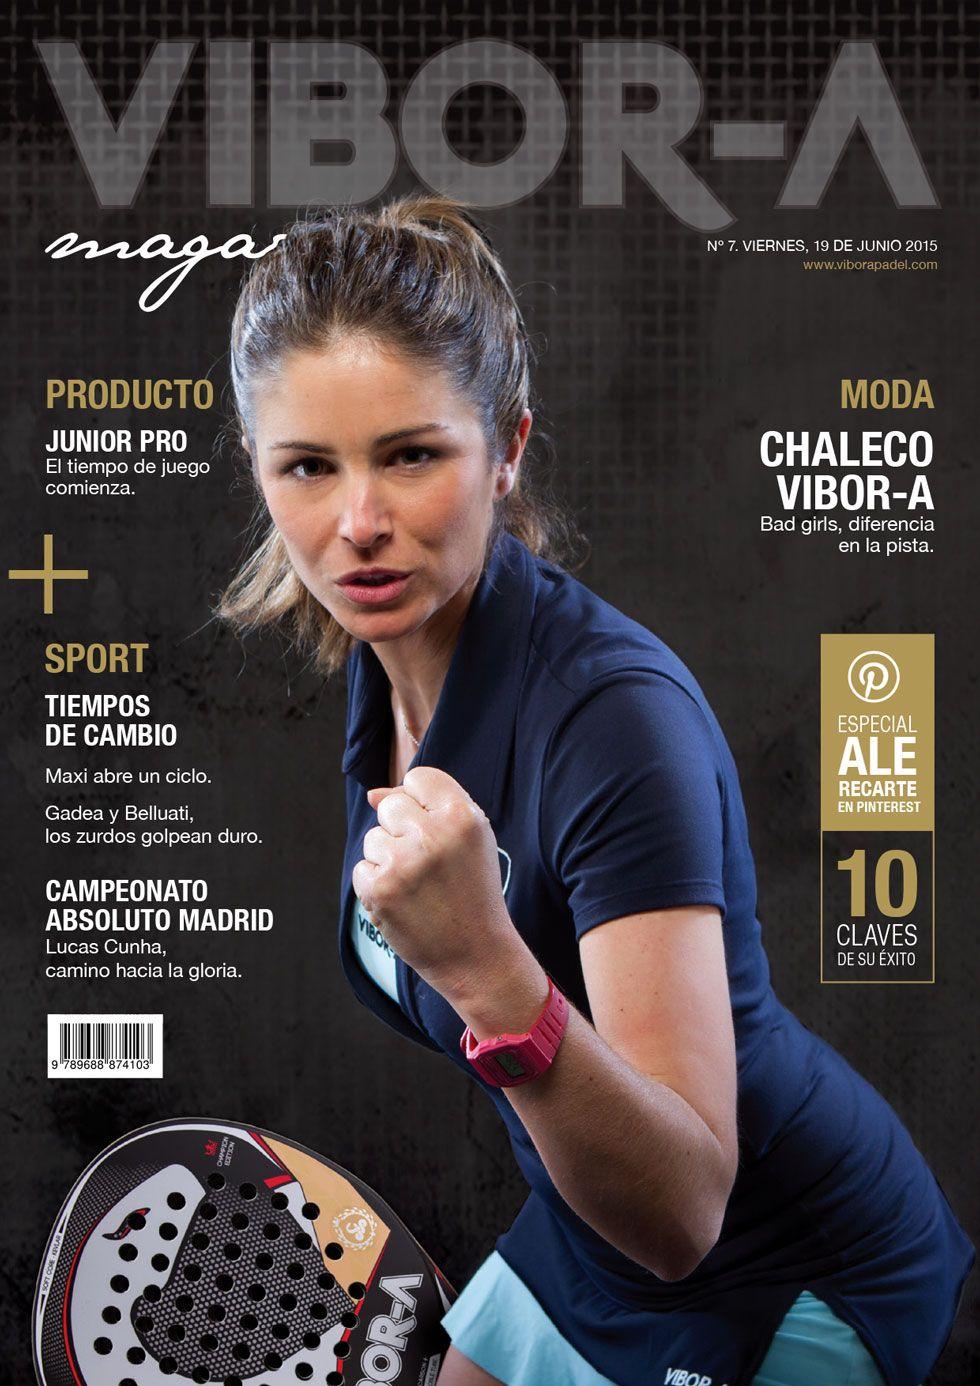 Alejandra Recarte en portada.